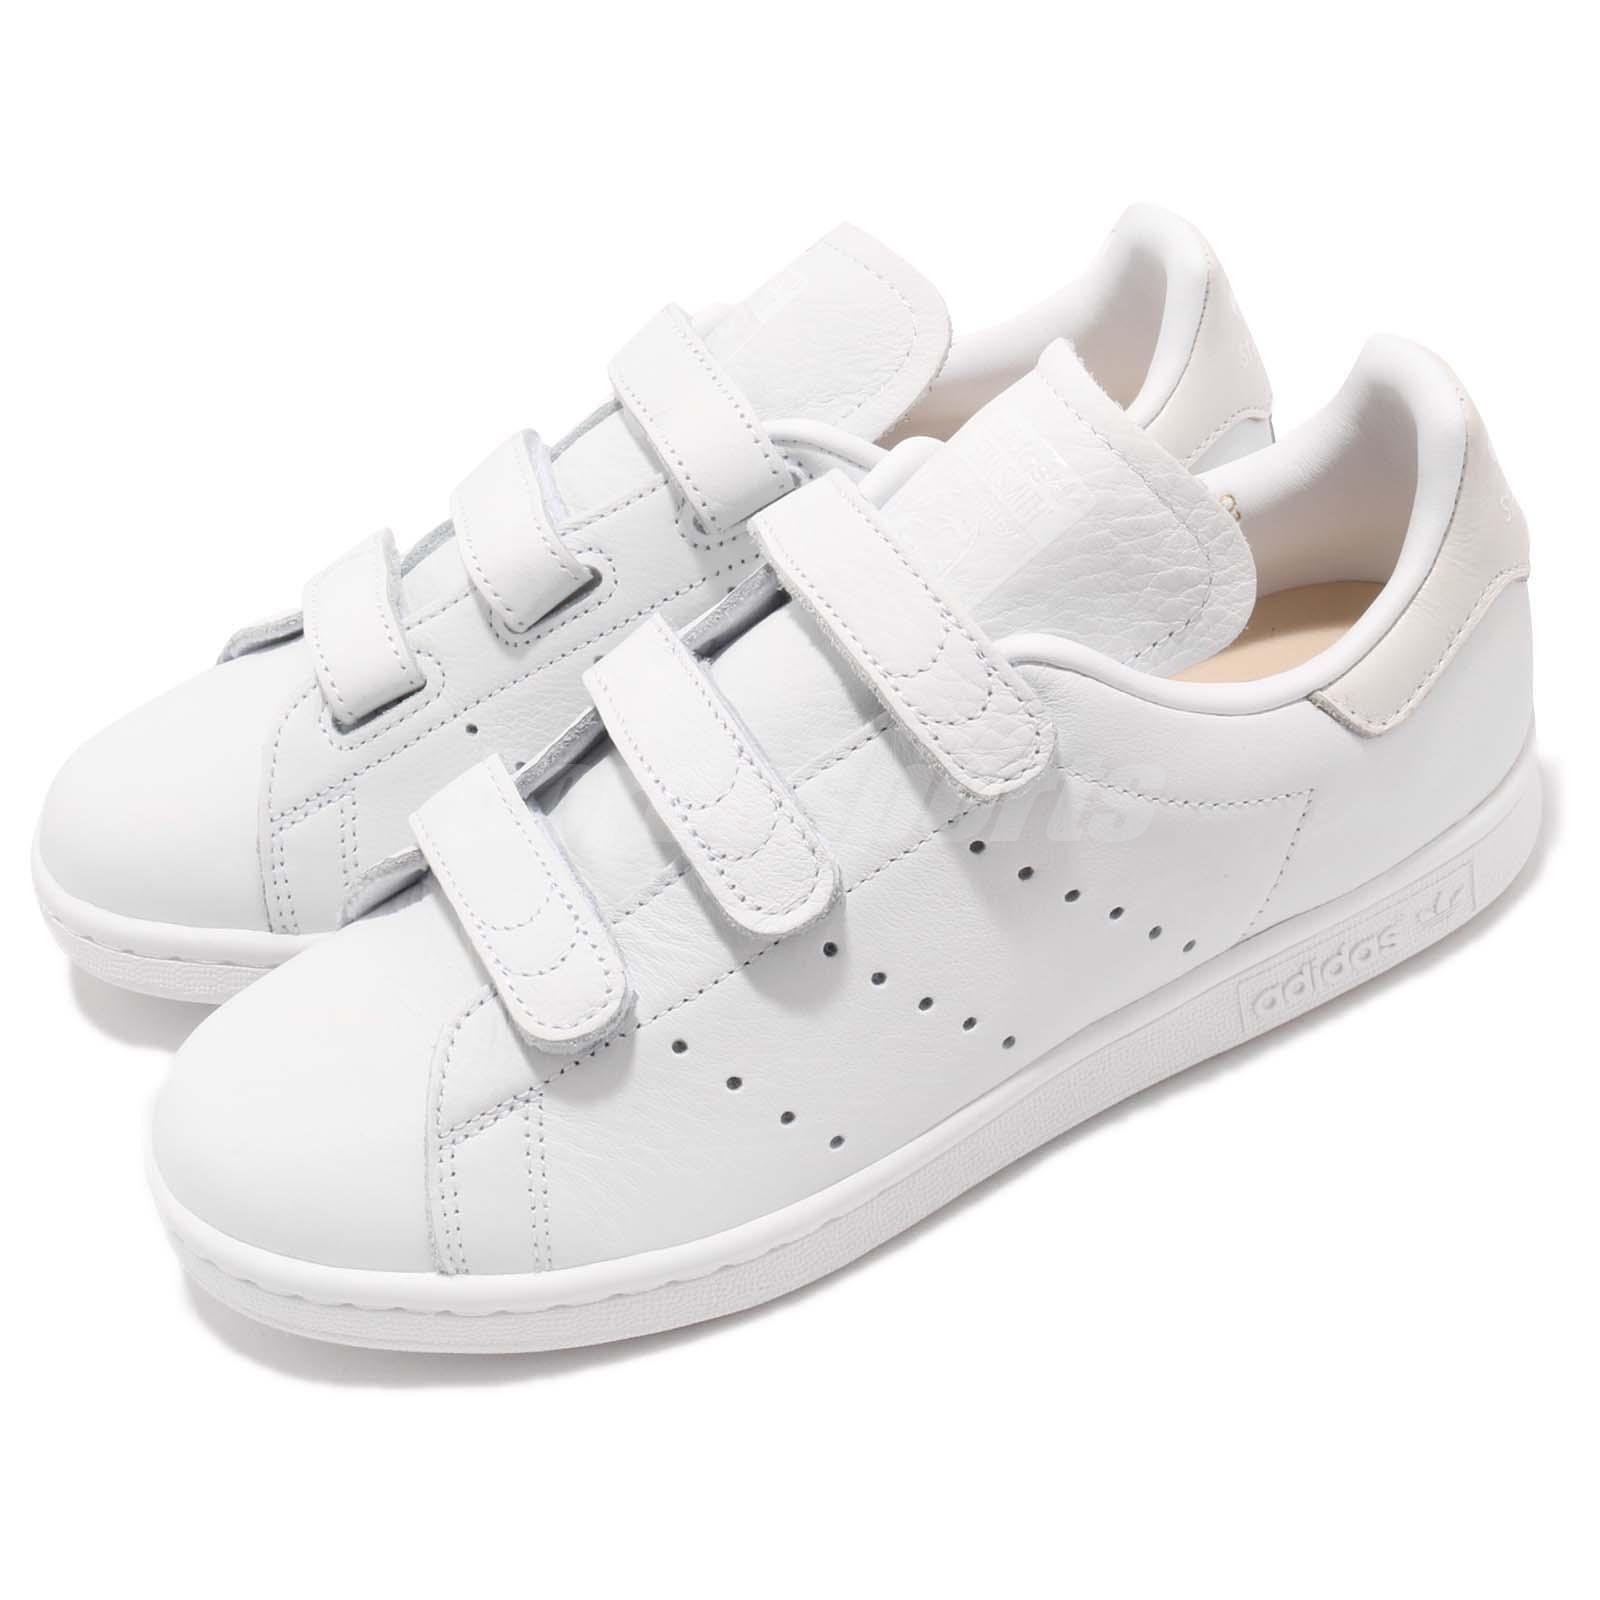 adidas Originals Stan Smith CF Straps Cloud White Men Women Shoes Sneaker CQ2632